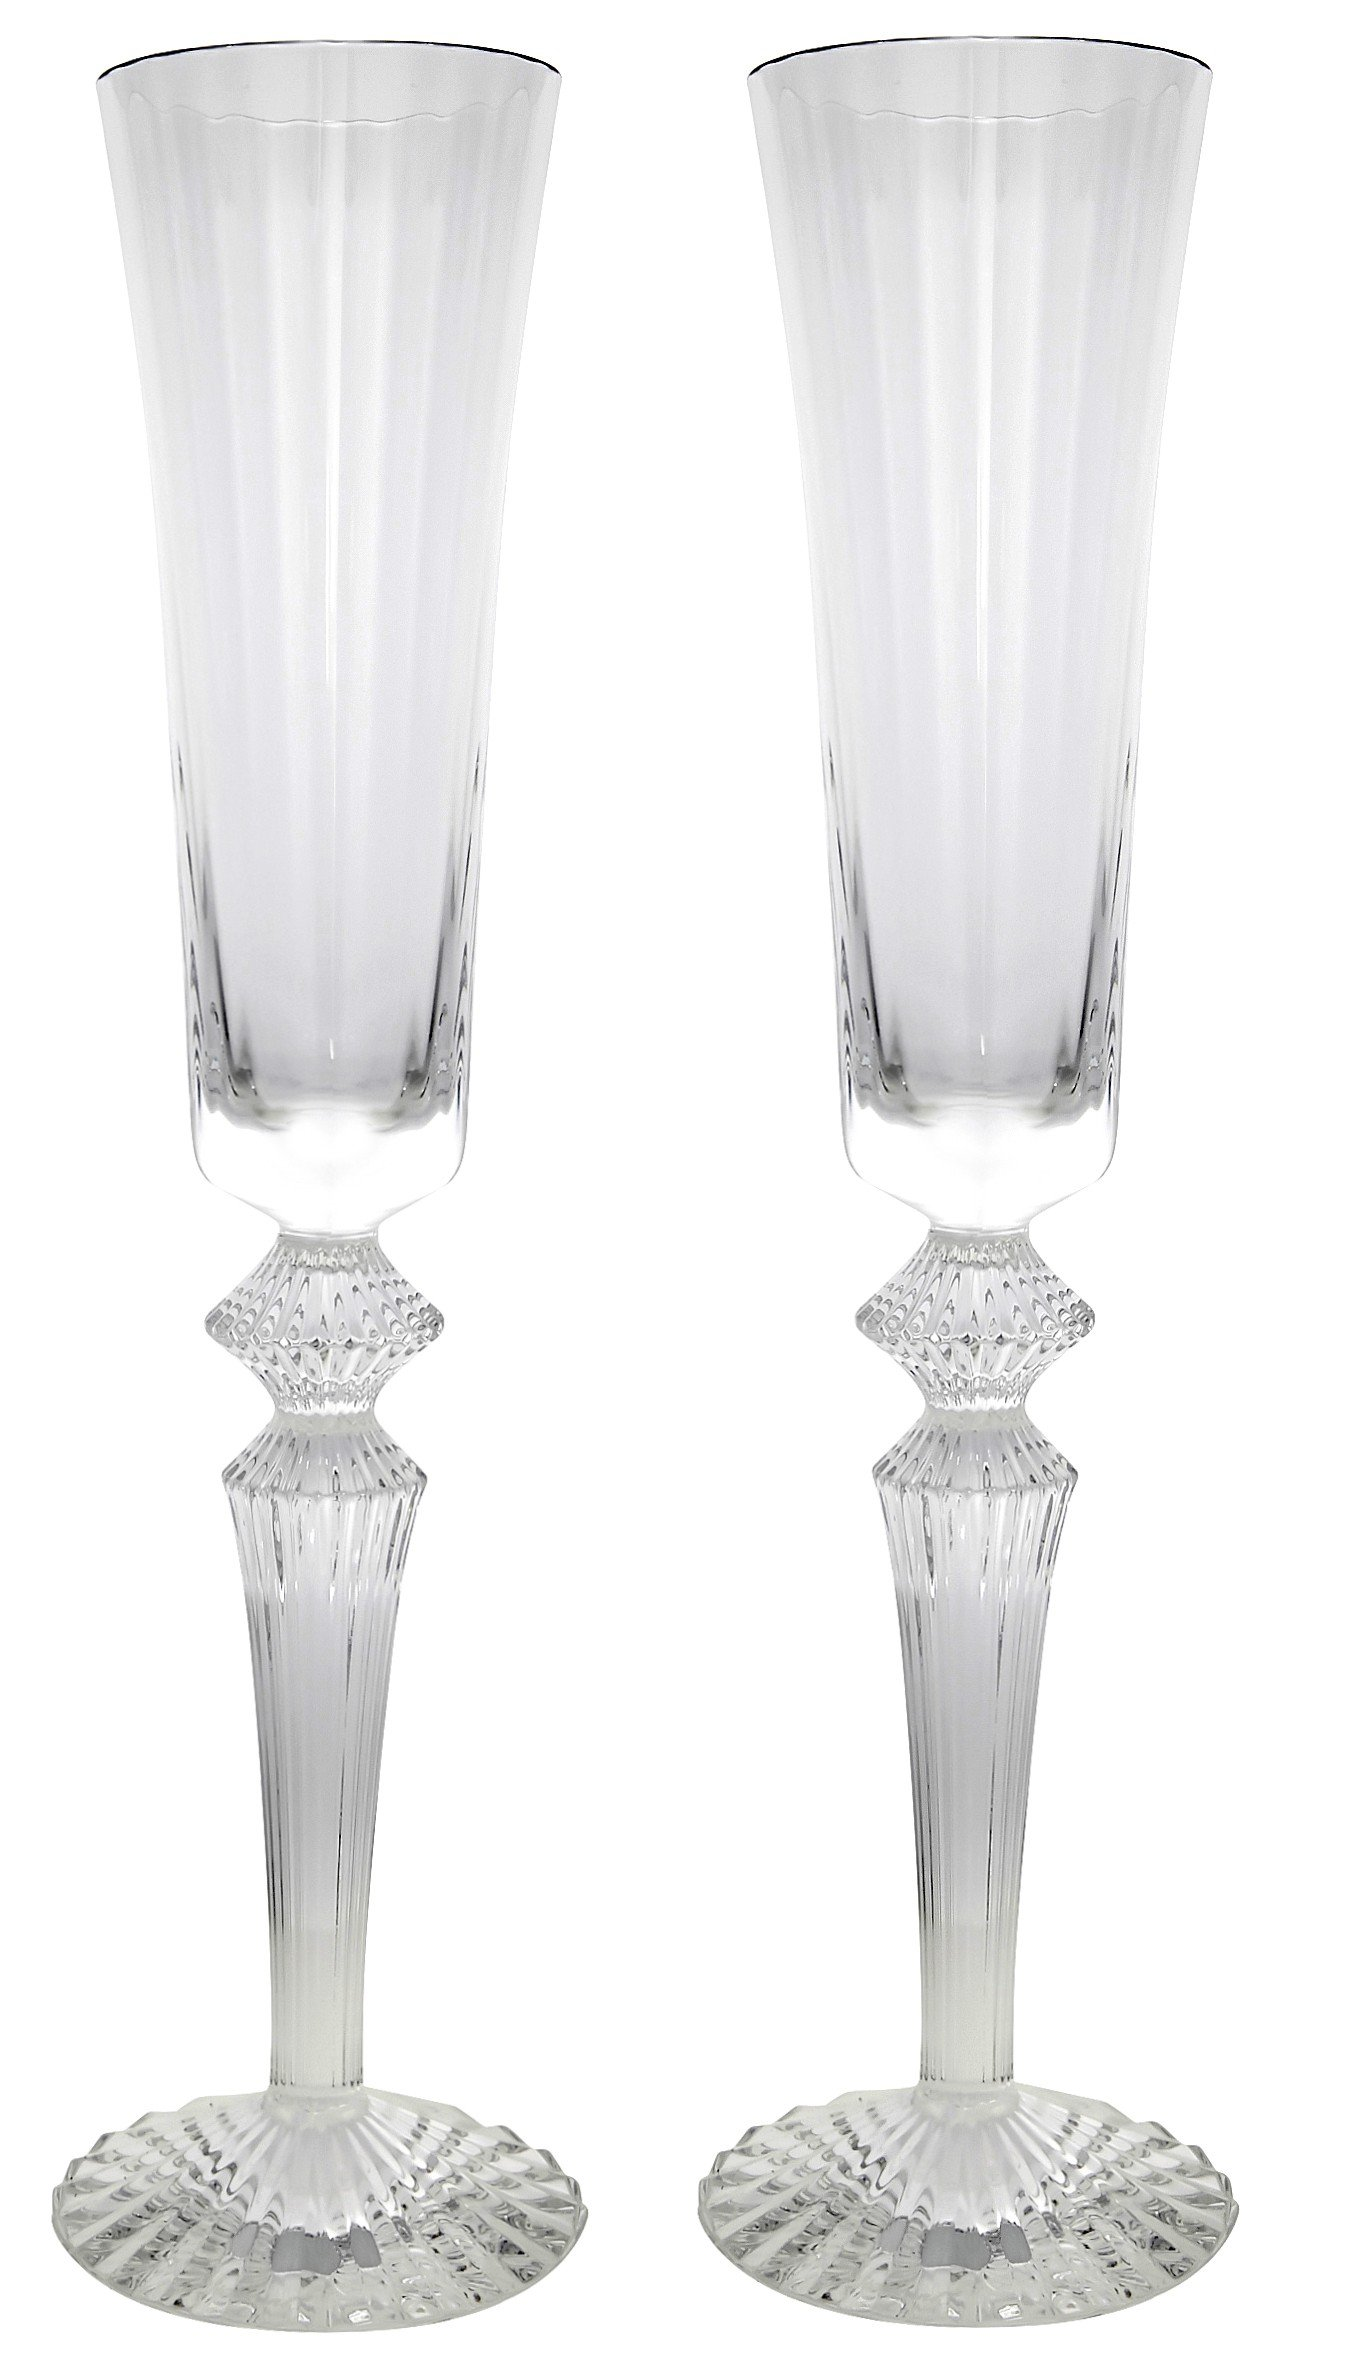 Baccarat Mille Nuits Champagne Flutes Set of 2 2810597